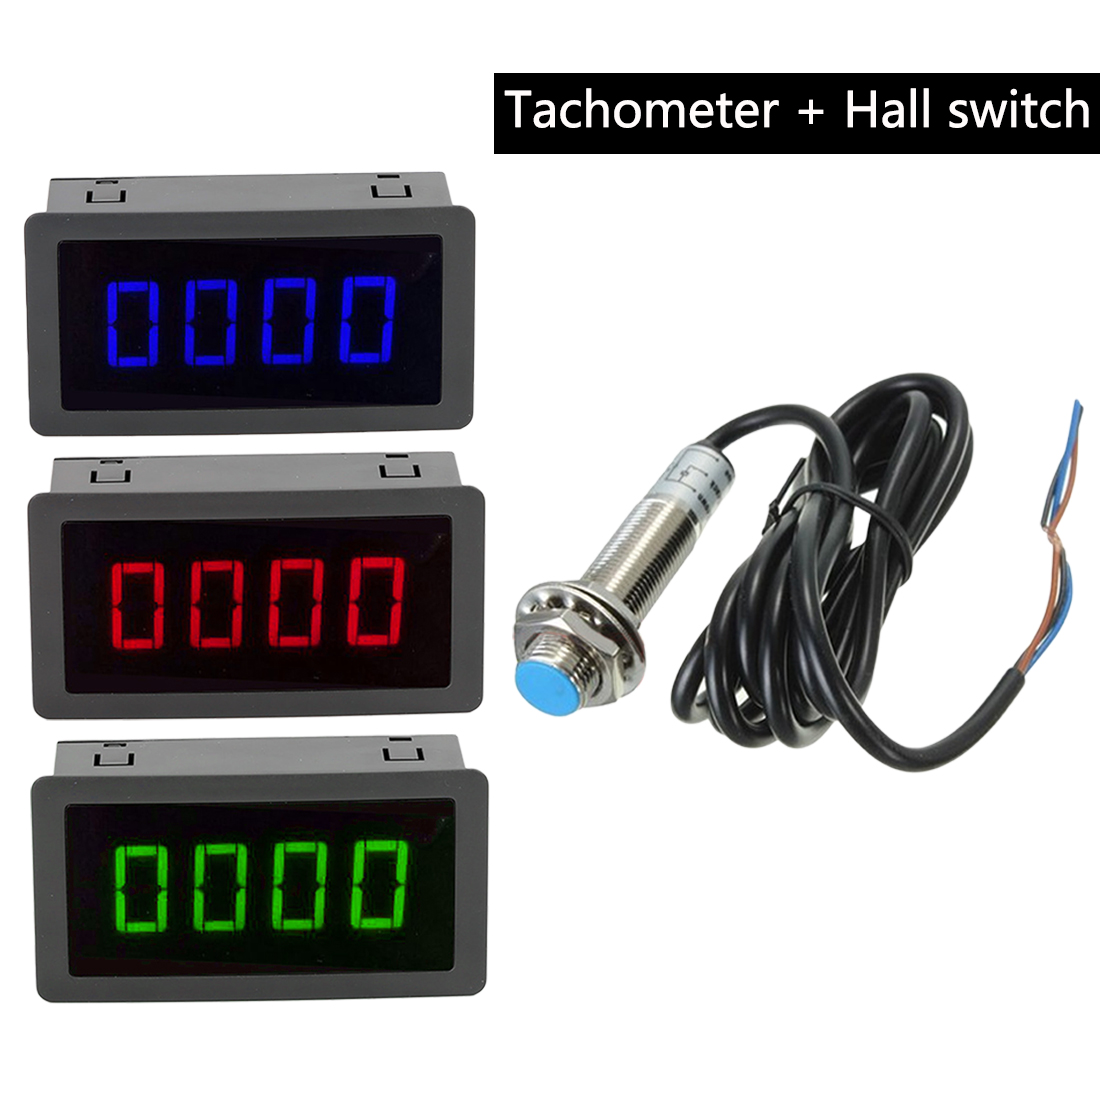 Digital LED Tachometer RPM Speed Meter Motorcycle Bike Tachometer Gauge With Hall Proximity Switch Sensor NPN  Motor Tachometer